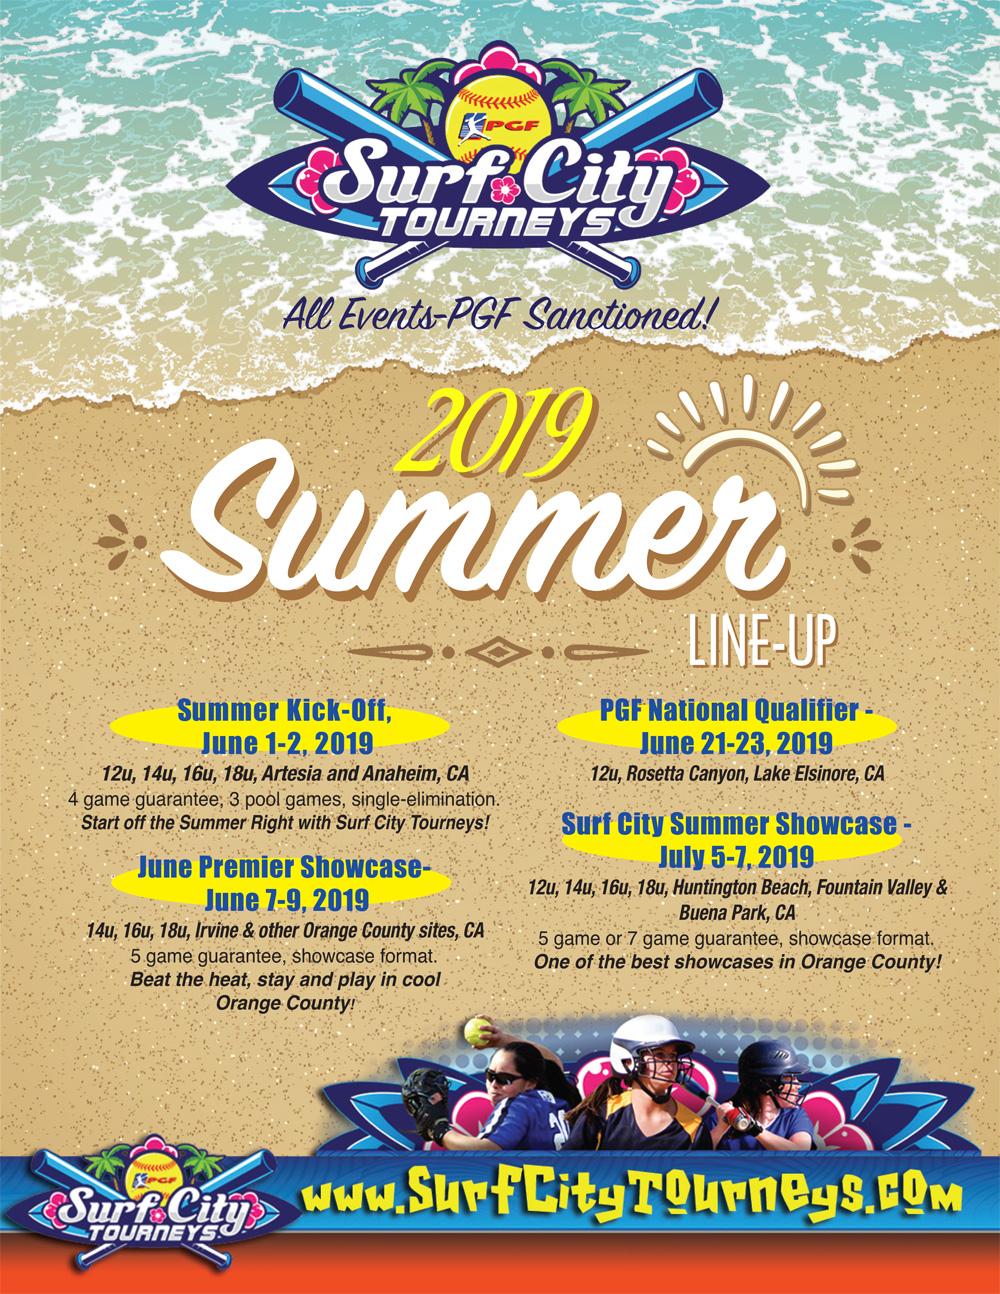 Surf City Softball Summer Tournament